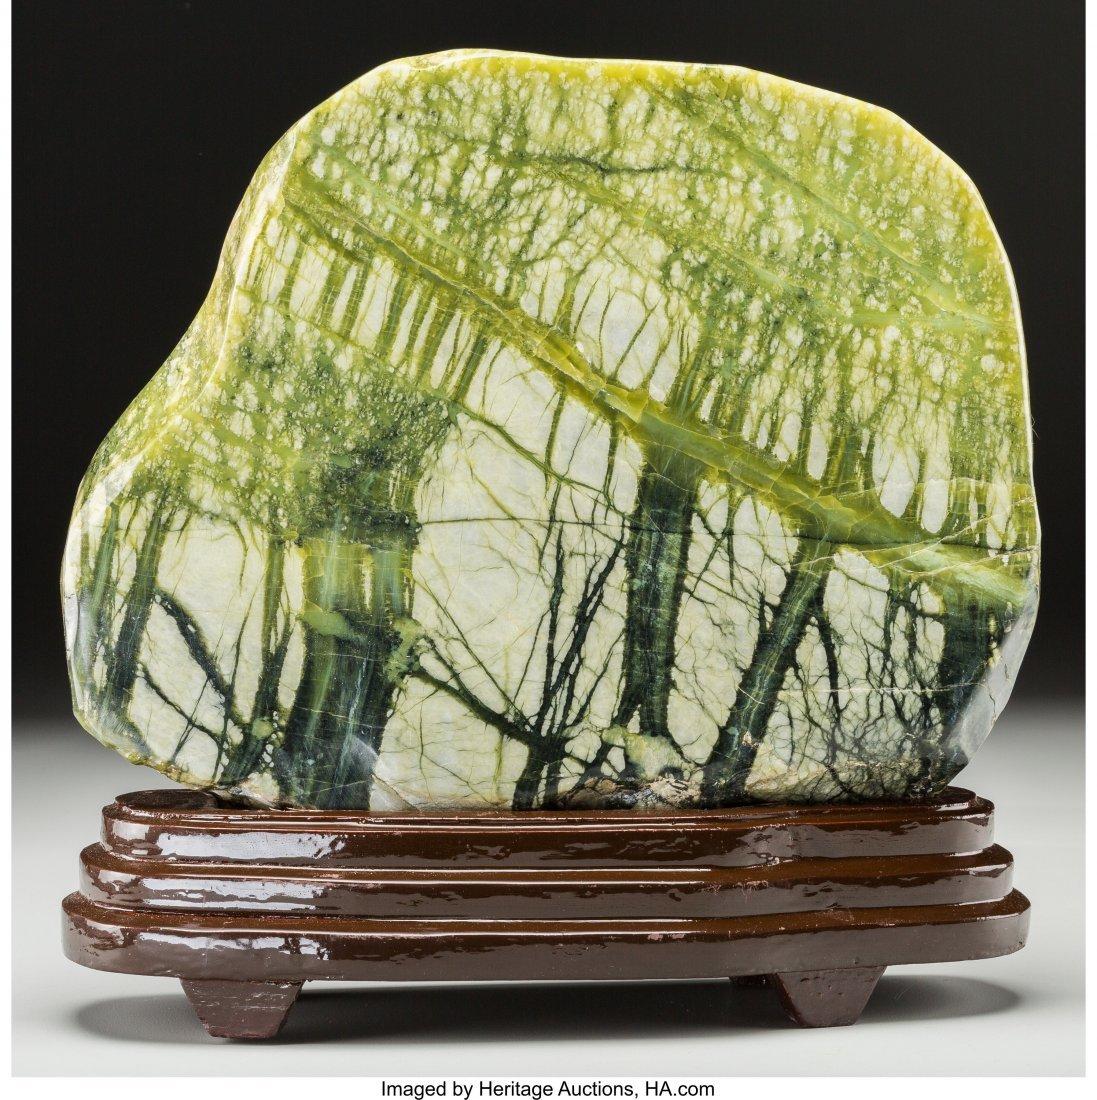 63723: A Chinese Henan Hsiuyen Scholar's Rock with Stan